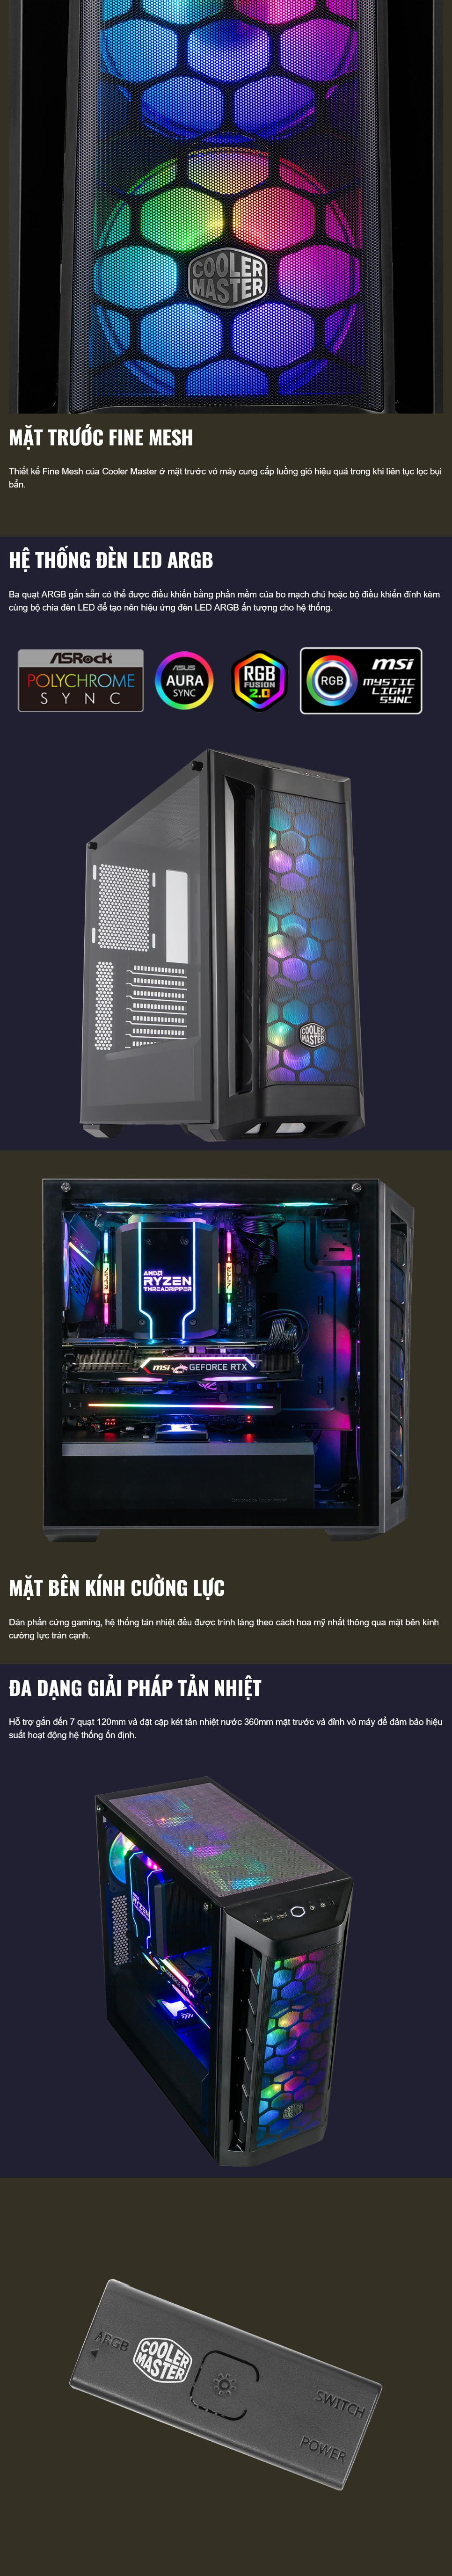 Vỏ máy tính Case Cooler Master Masterbox MB511 ARGB